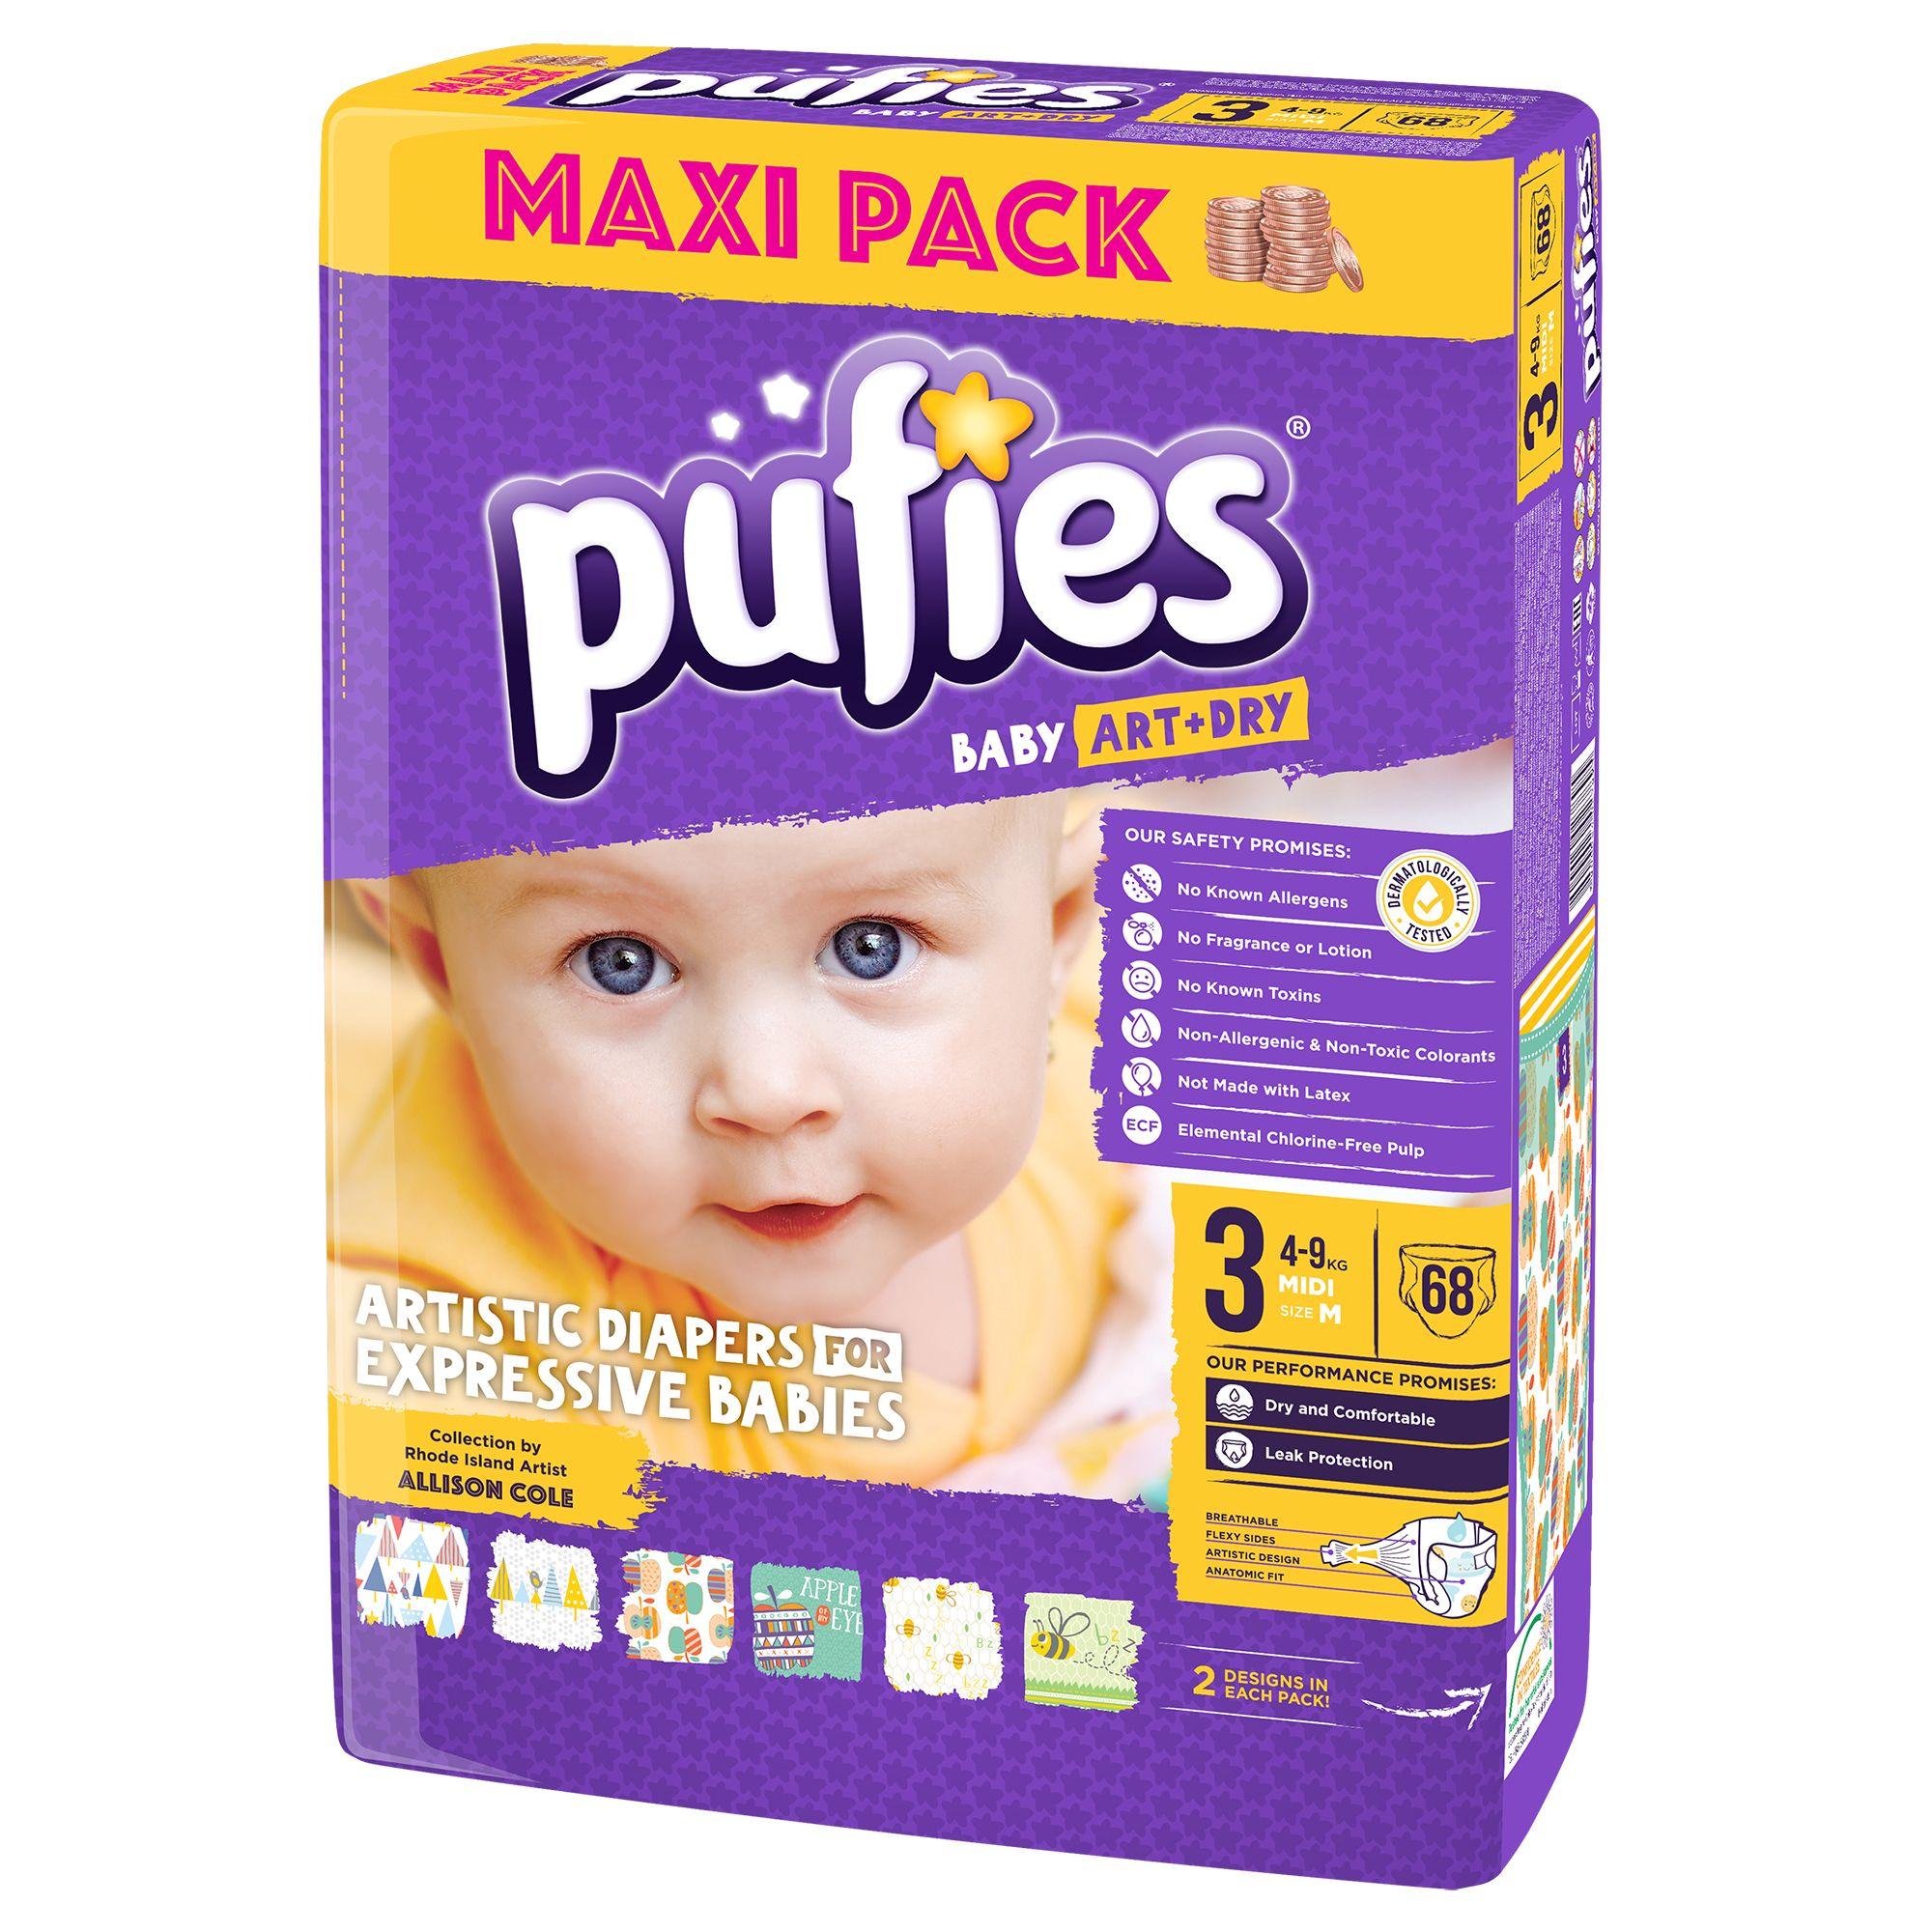 Пелени пуфис pufies art and dry 3 4-9 кг maxi pack